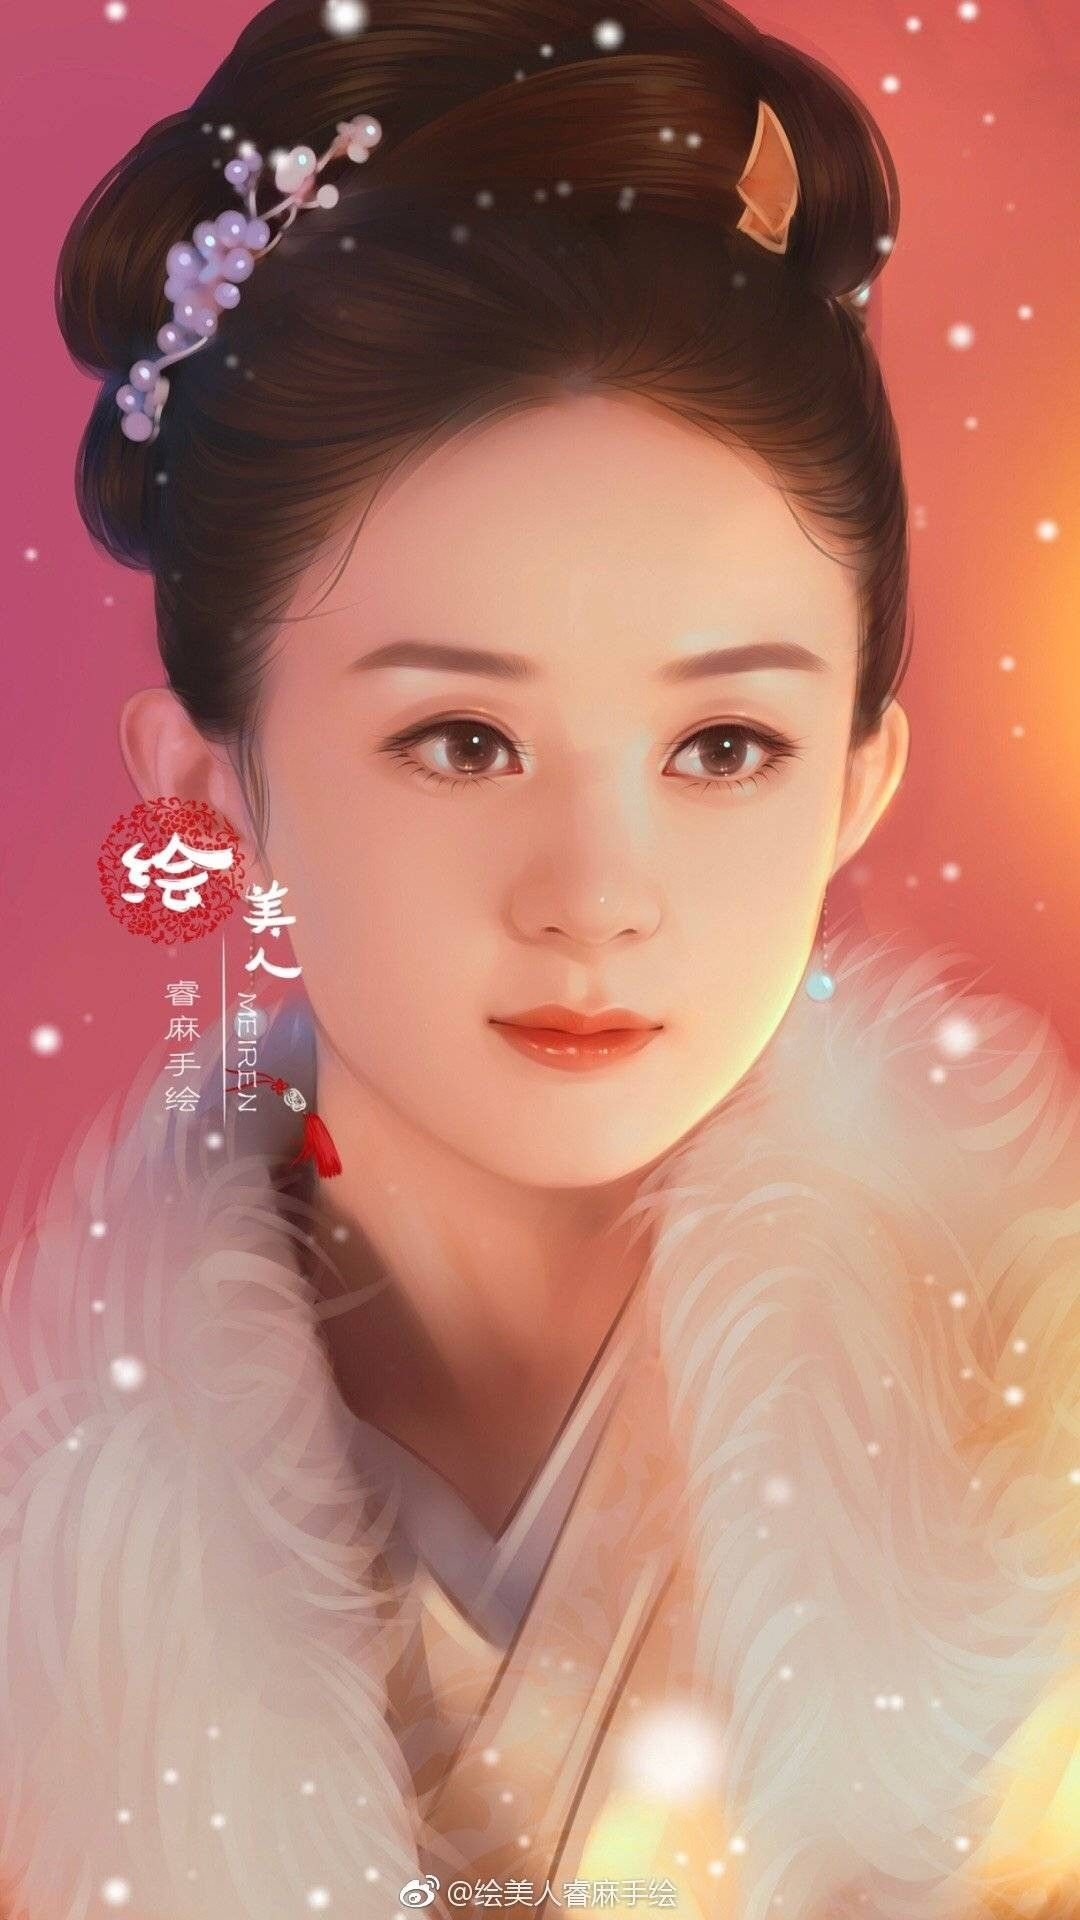 Pin oleh Sk k2528 di Zhao liying(จ้าวลี่อิง) Gadis